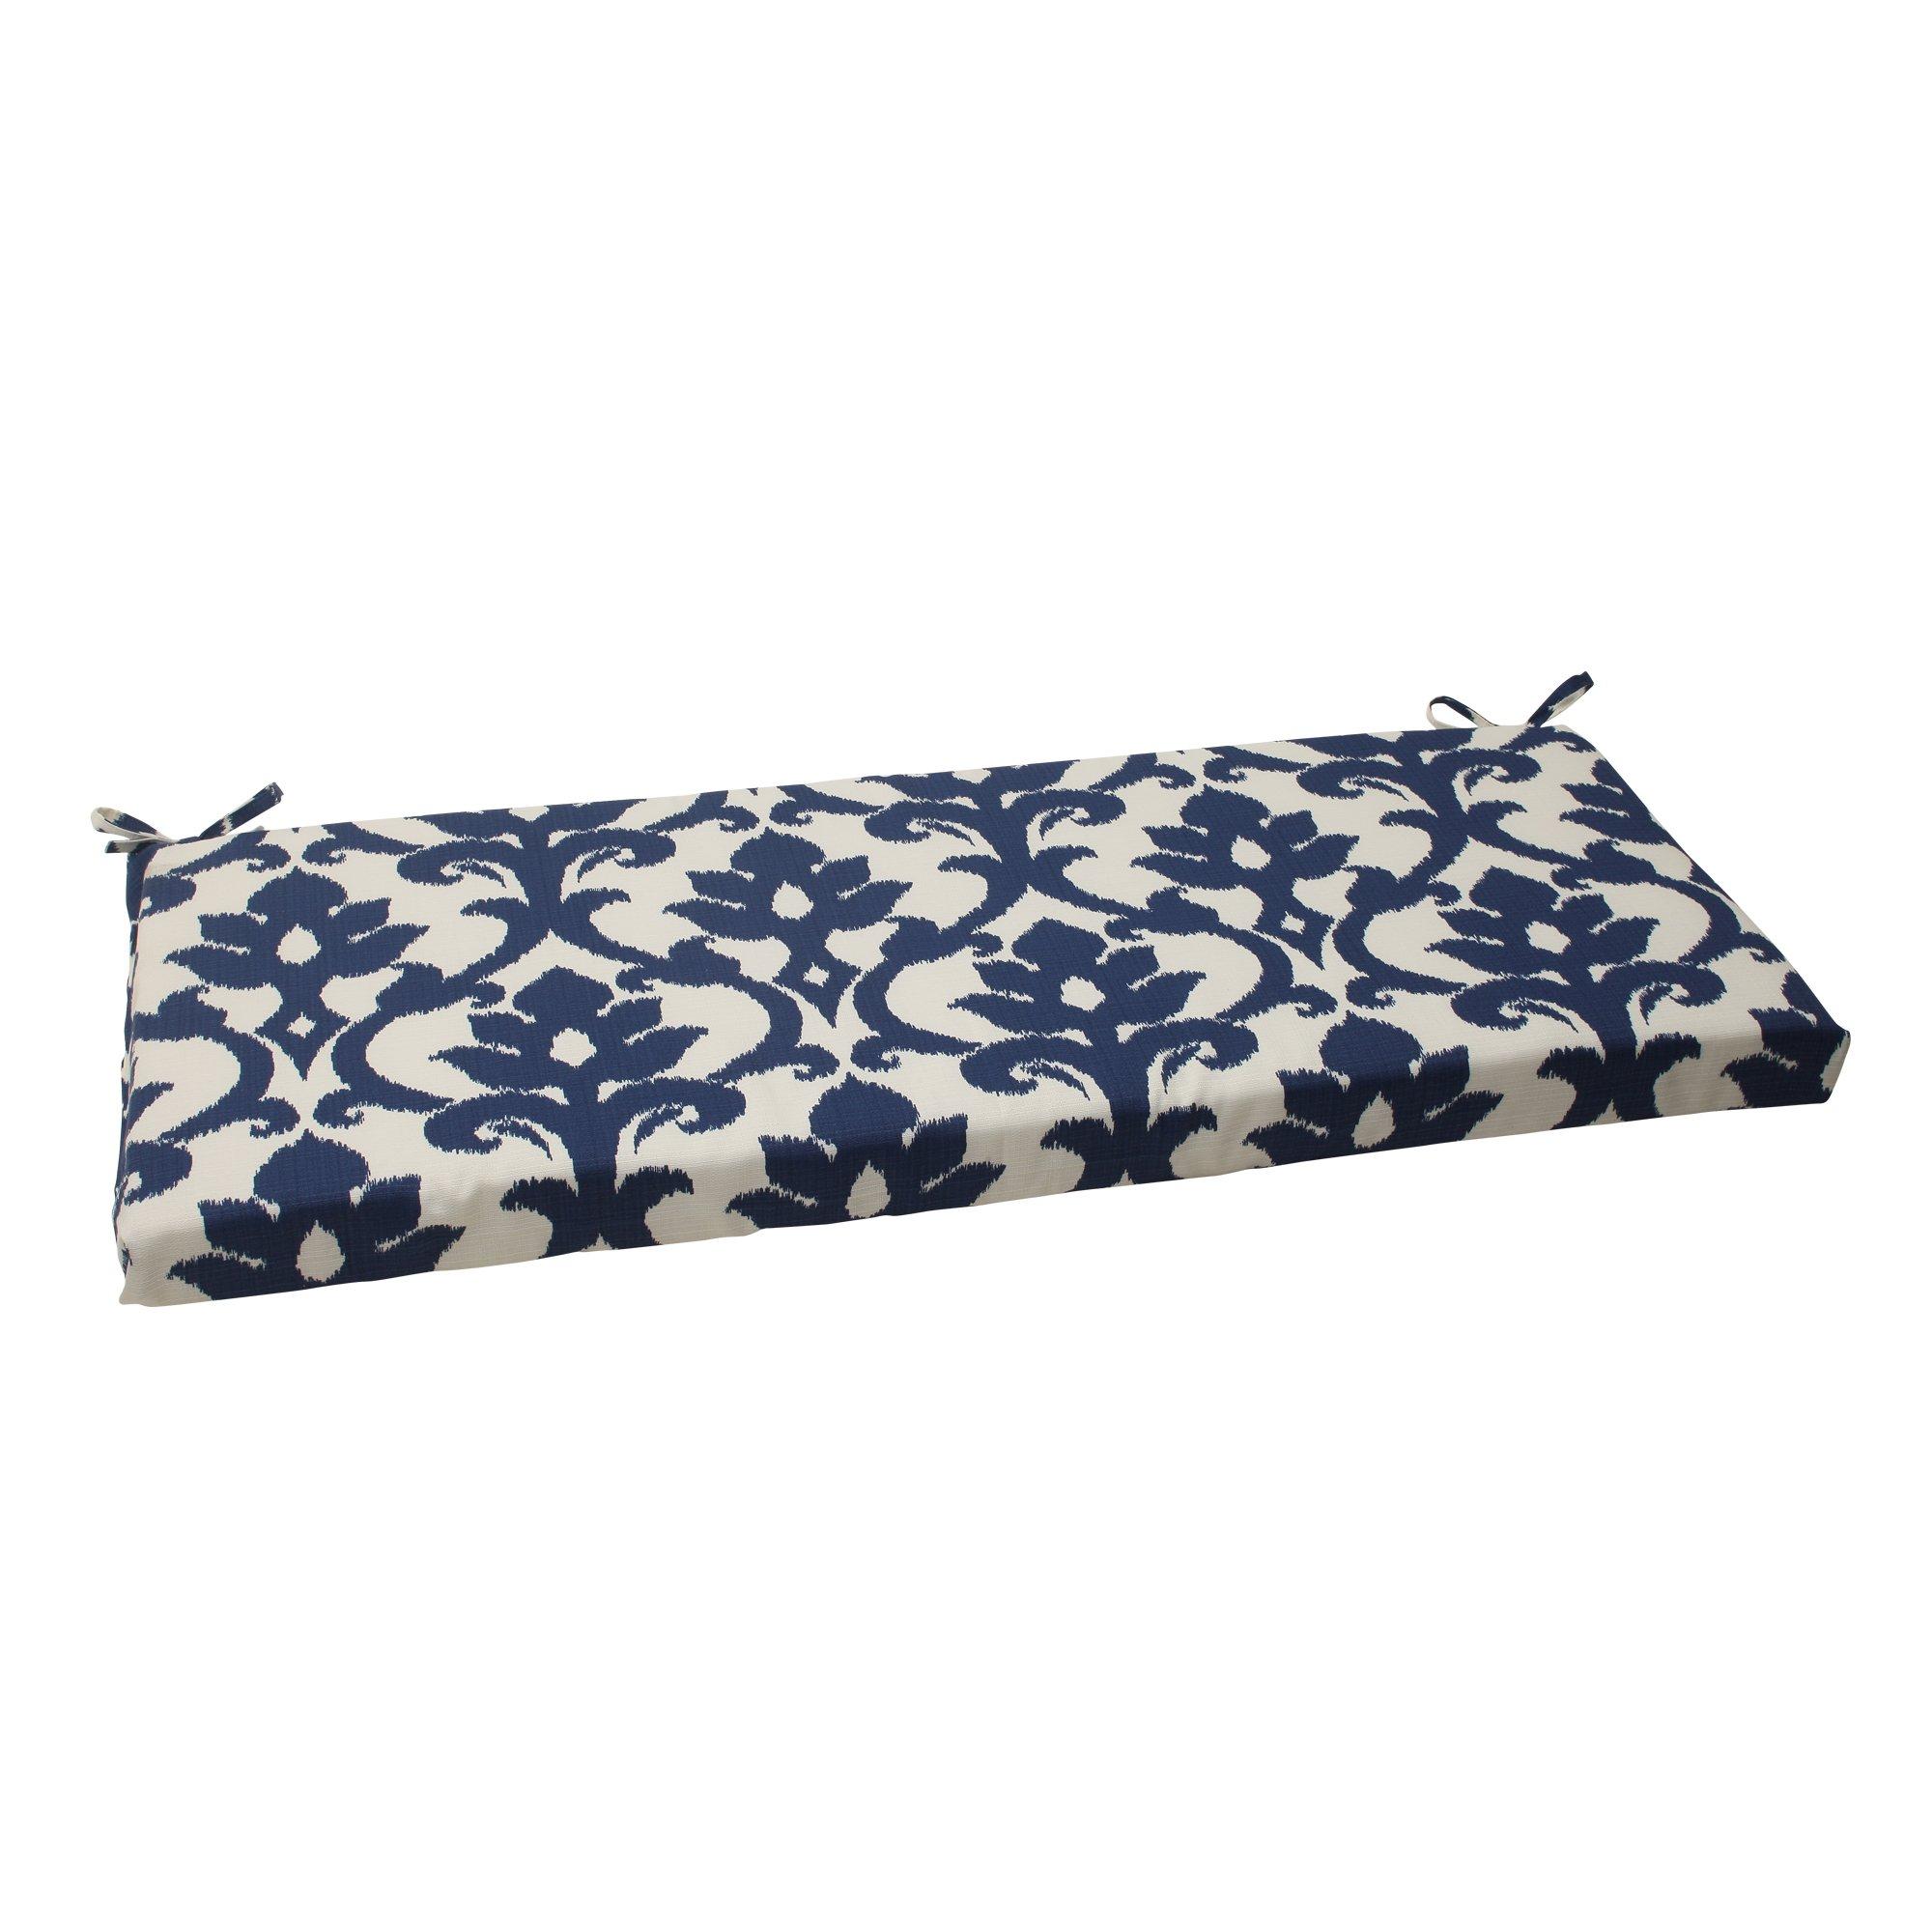 Pillow Perfect Indoor/Outdoor Bosco Bench Cushion Navy